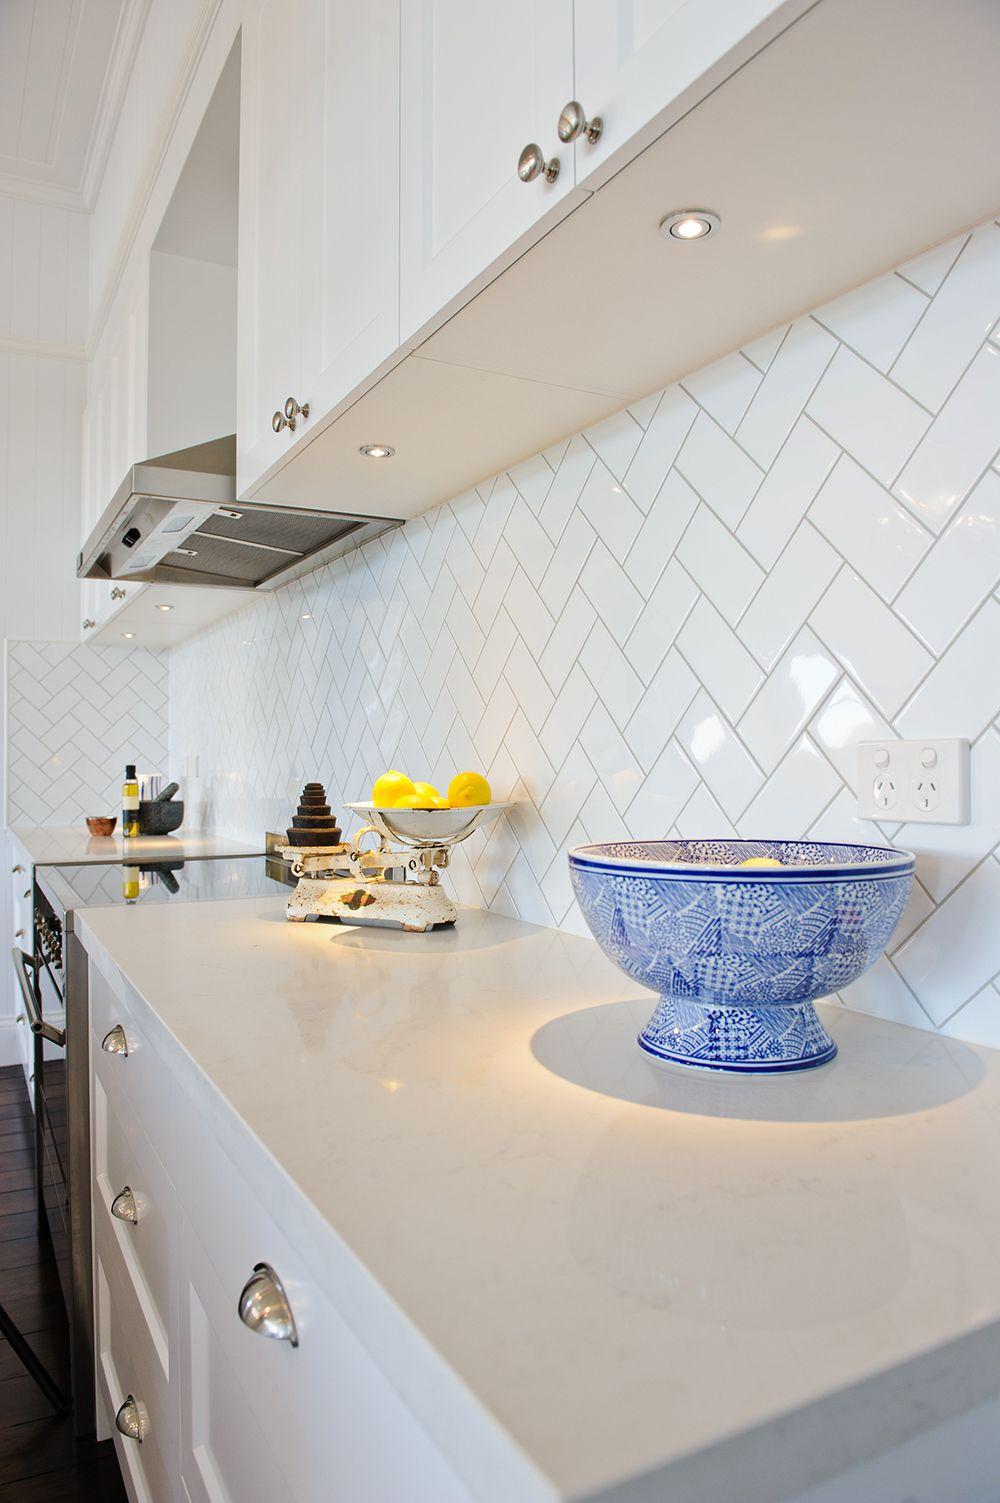 Kitchen Bathroom Design Ideas Inspiration Caesarstone Frosty Carrina Caesarstone Kitchen Remodel